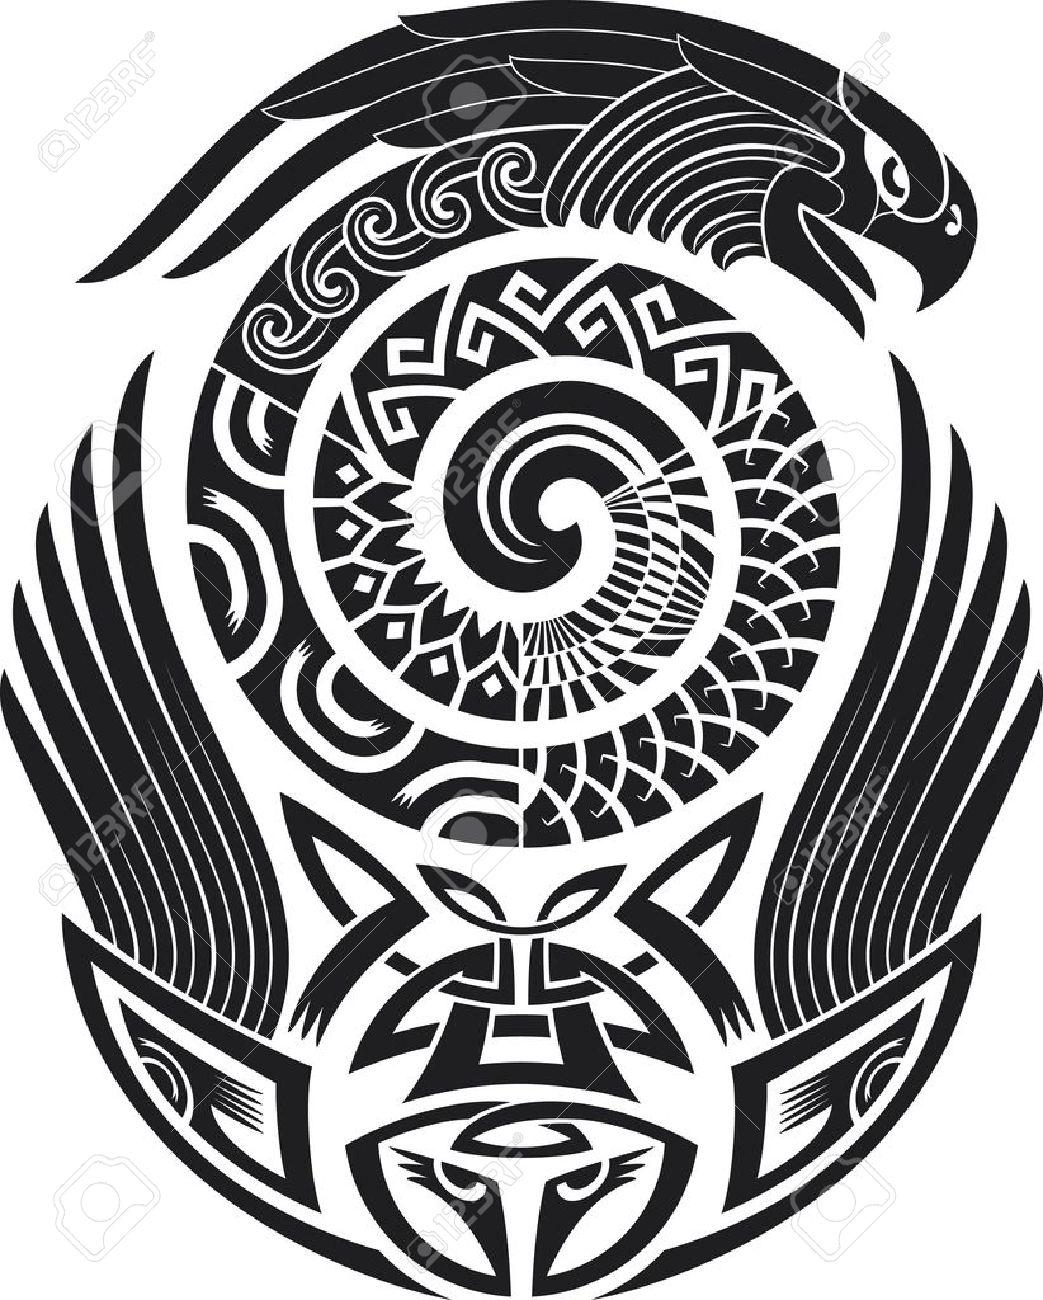 Tribal tattoo pattern. Fit for a shoulder. Vector illustration. - 12447702